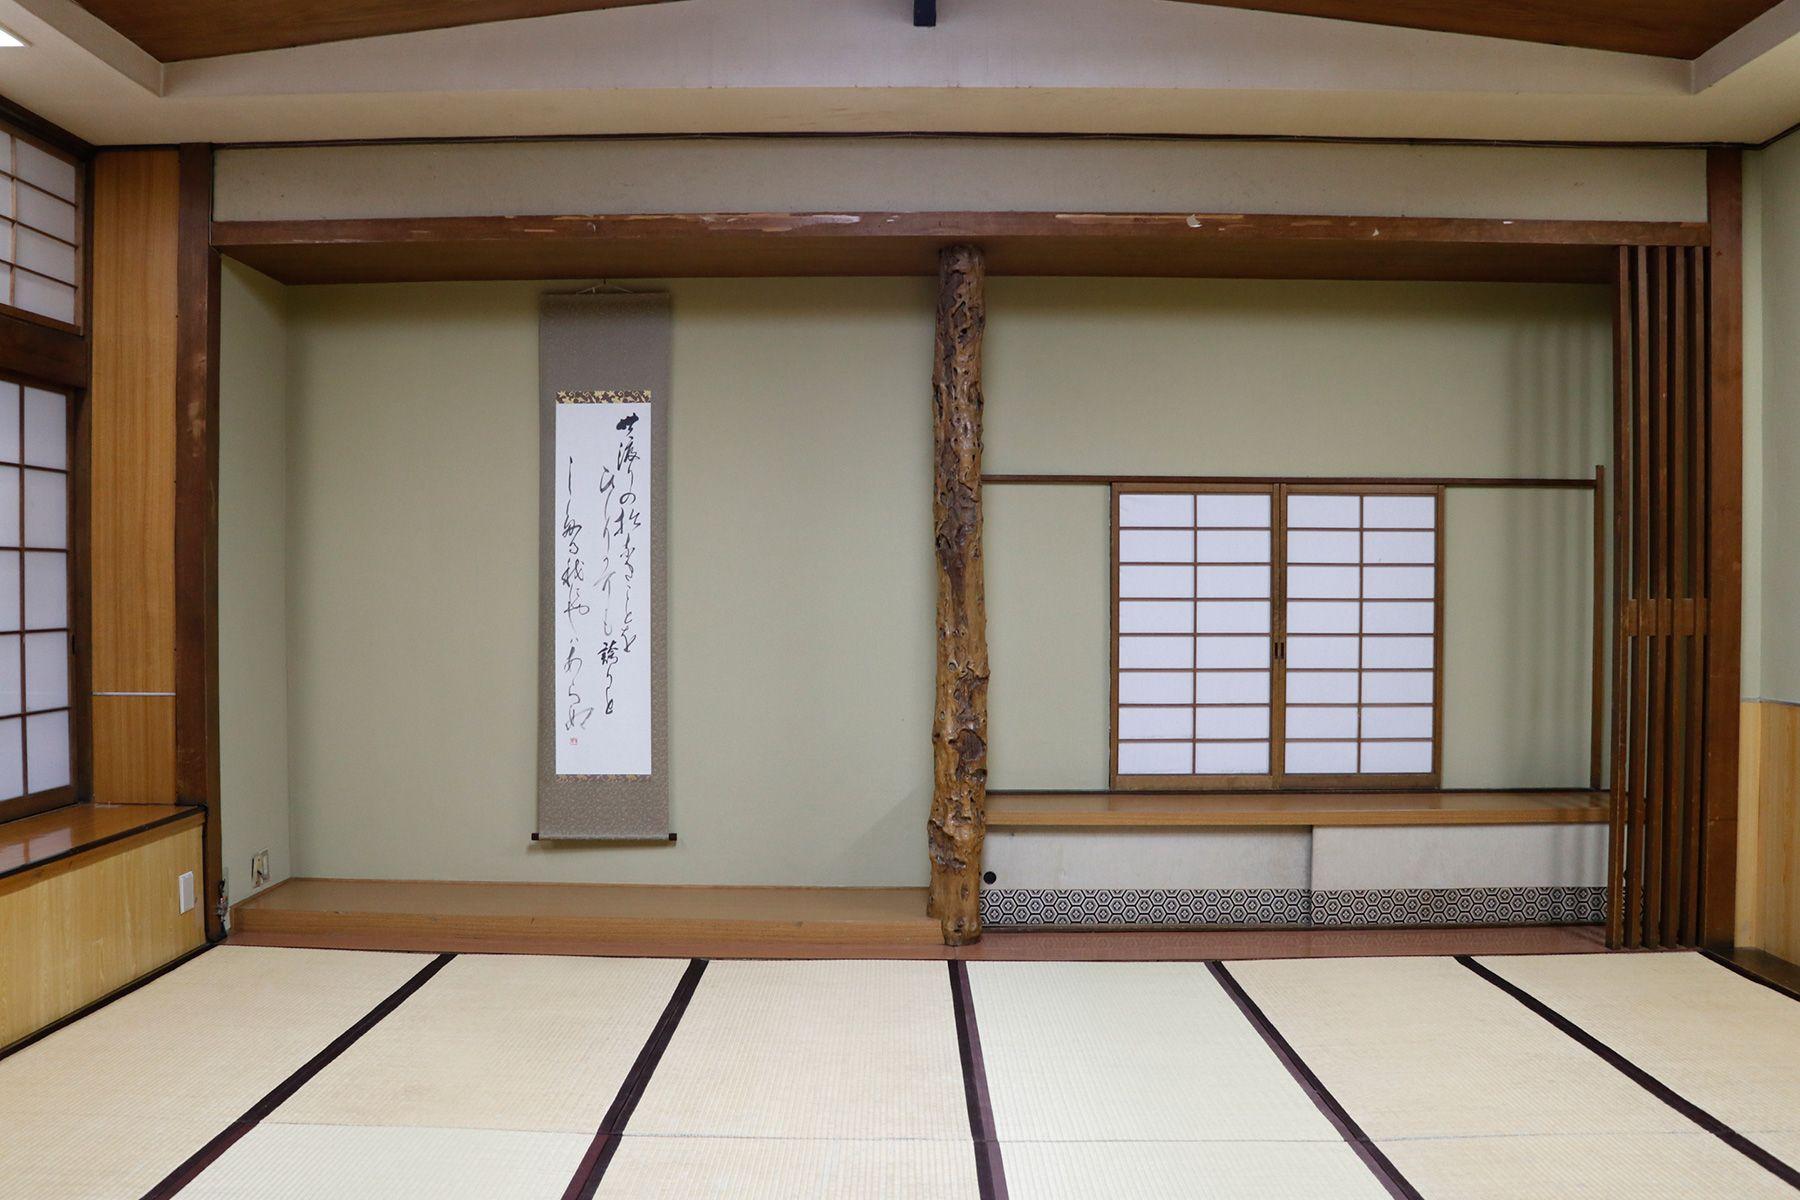 HOMEIKAN 森川別館/旅館 (ホウメイカン)大広間 57畳 3つの空間に仕切り可能